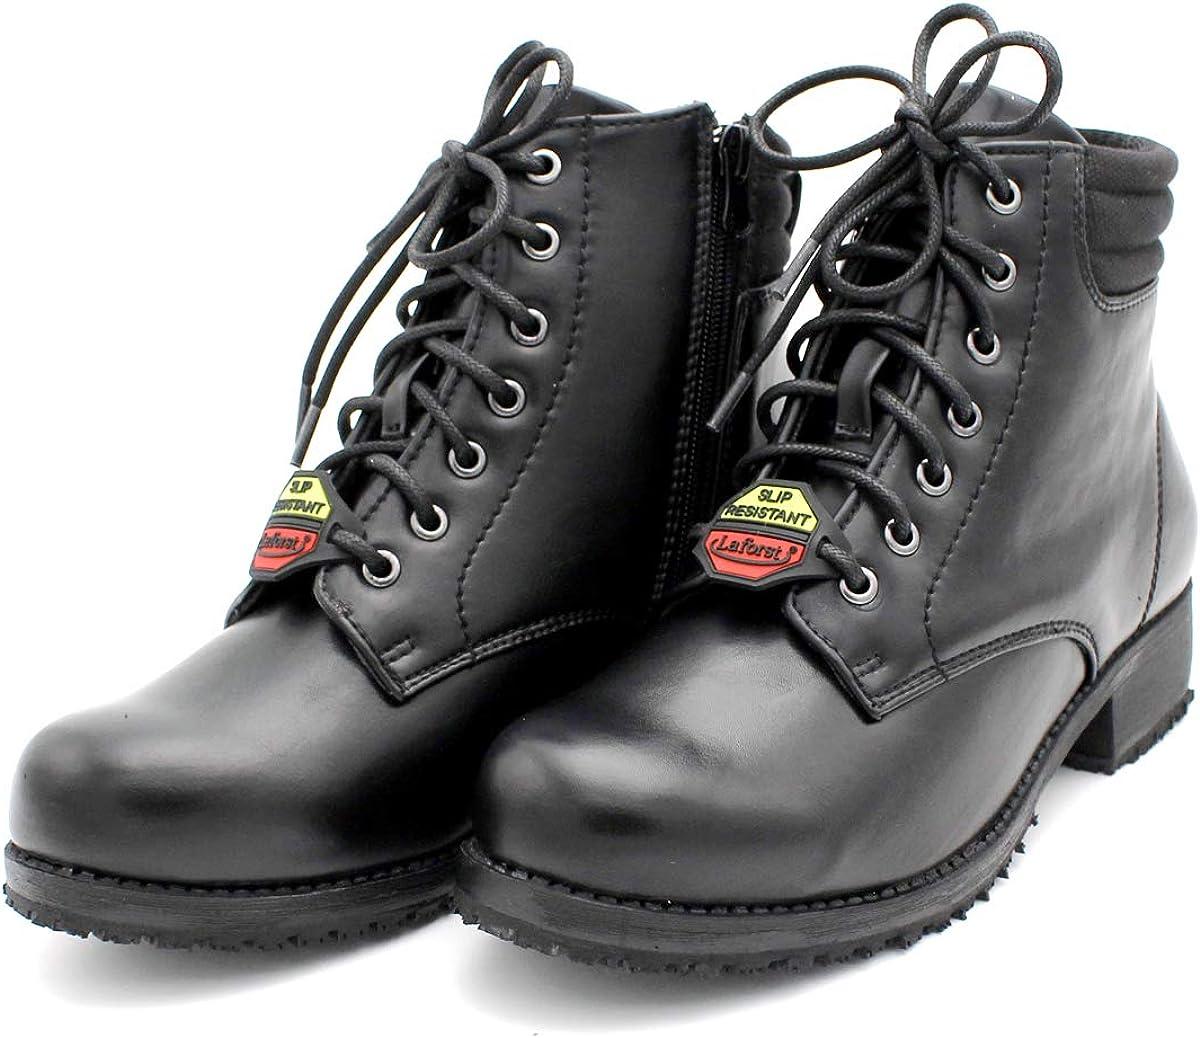 Laforst Womens 2289 Slip Resistant Work Ankle Black Boots